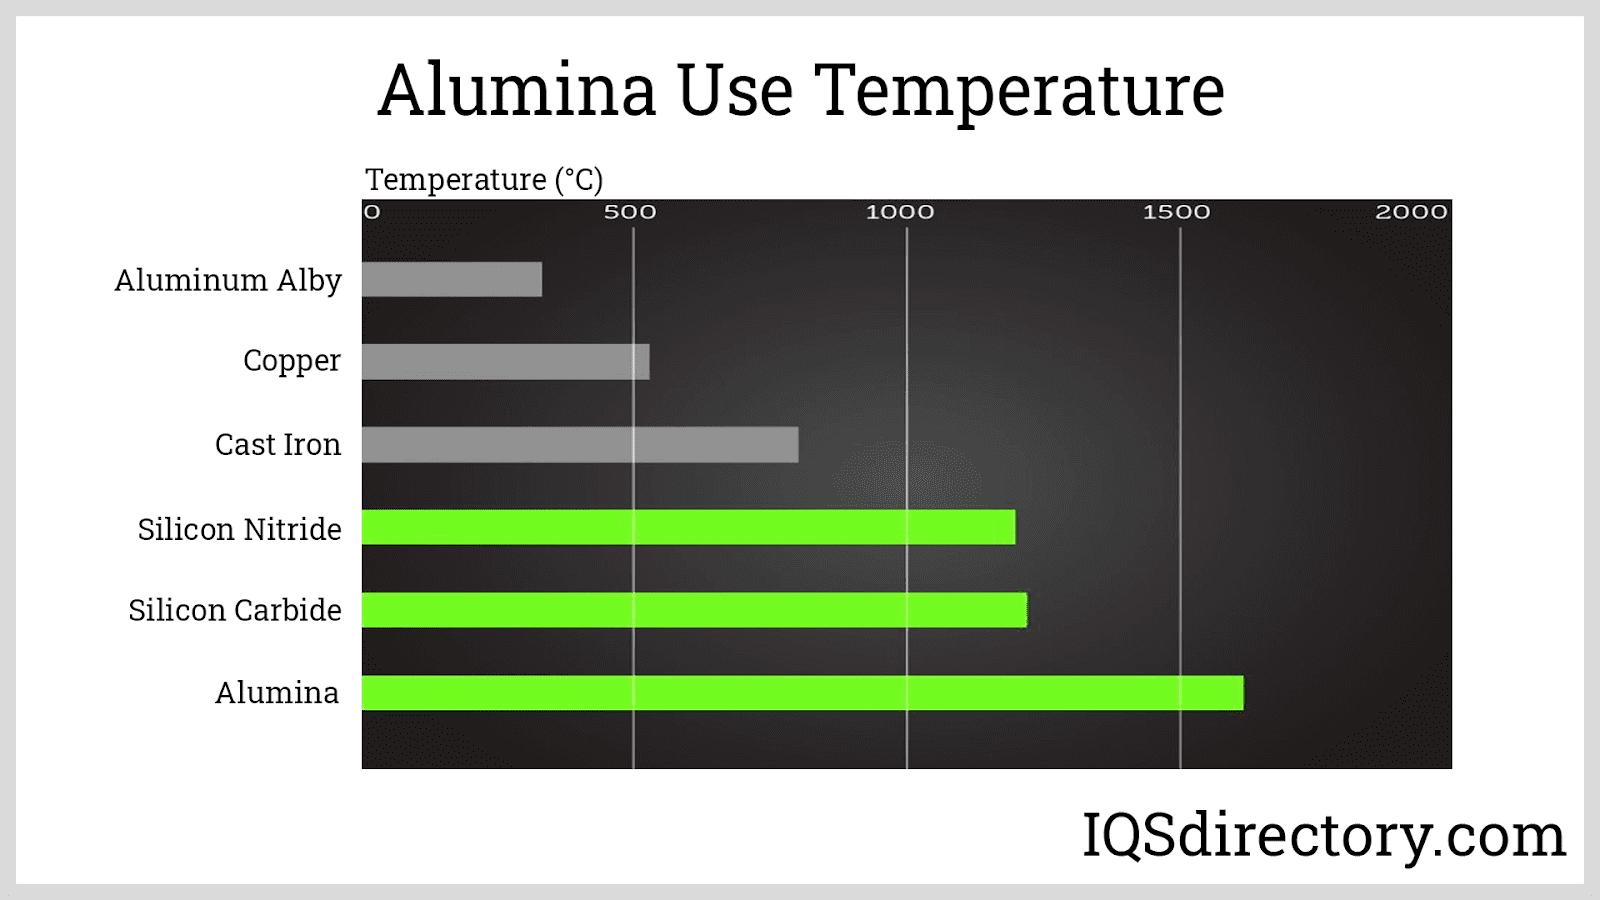 Alumina Use Temperature